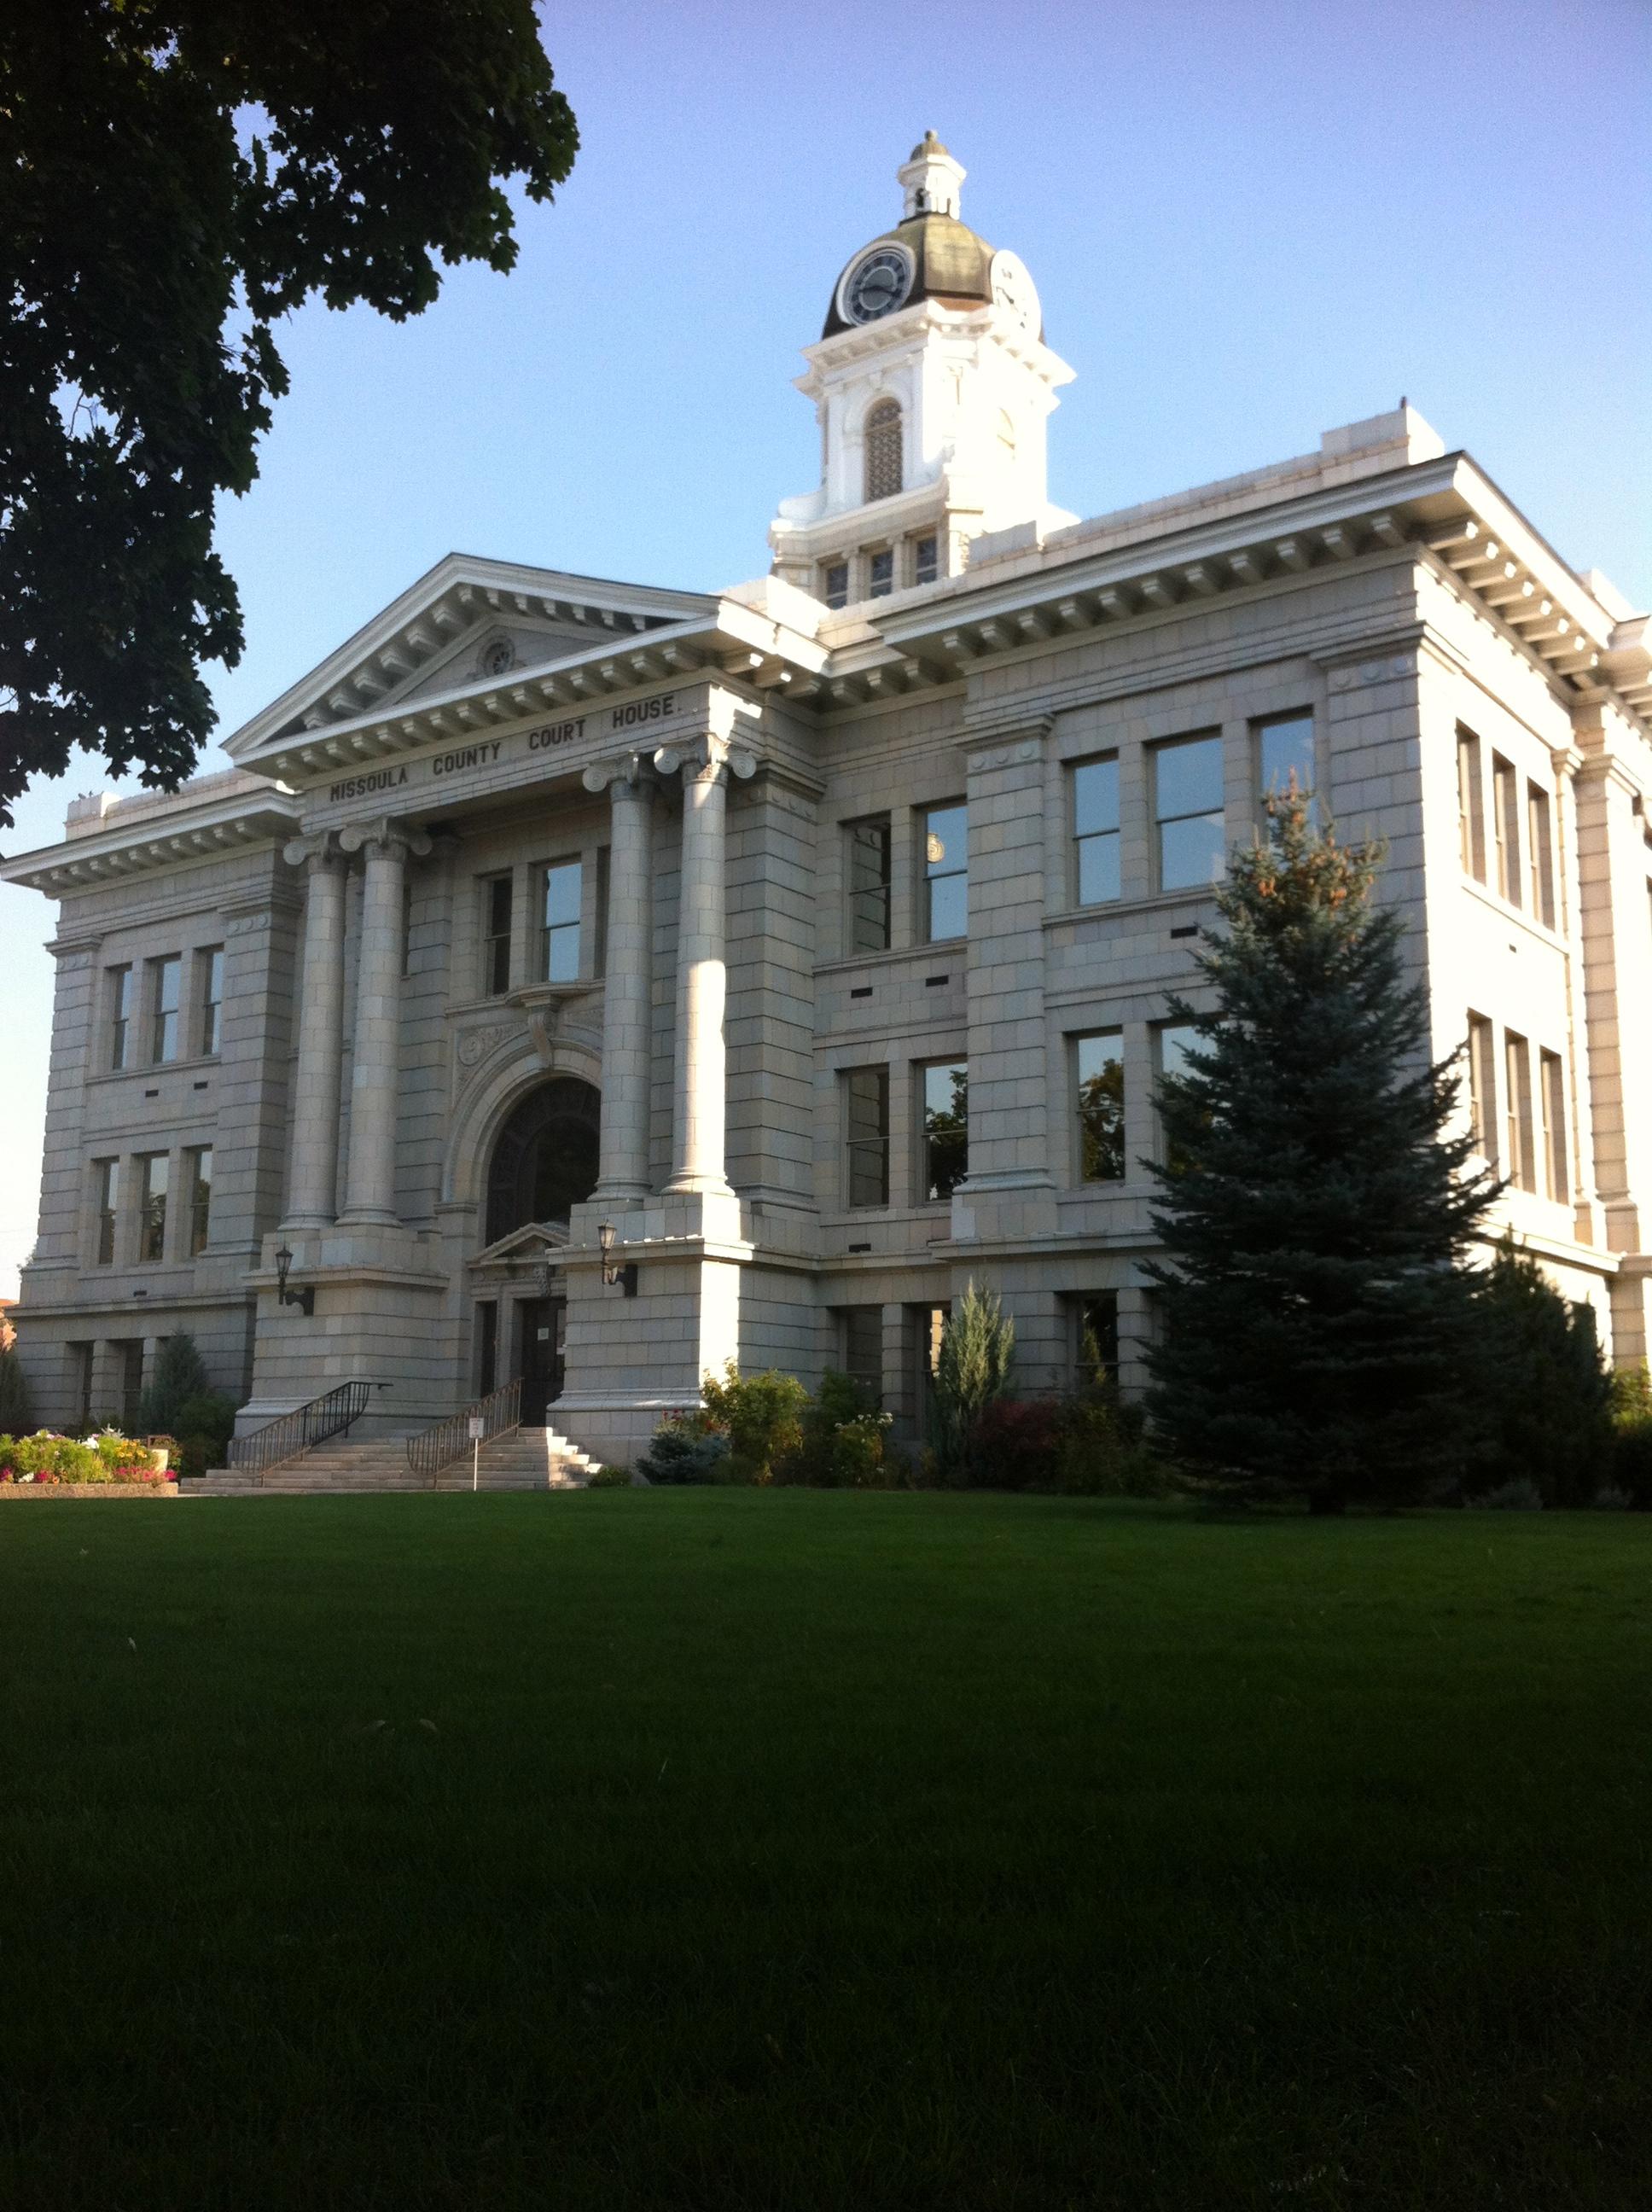 JM Engineering Missoula County Courthouse HVAC system